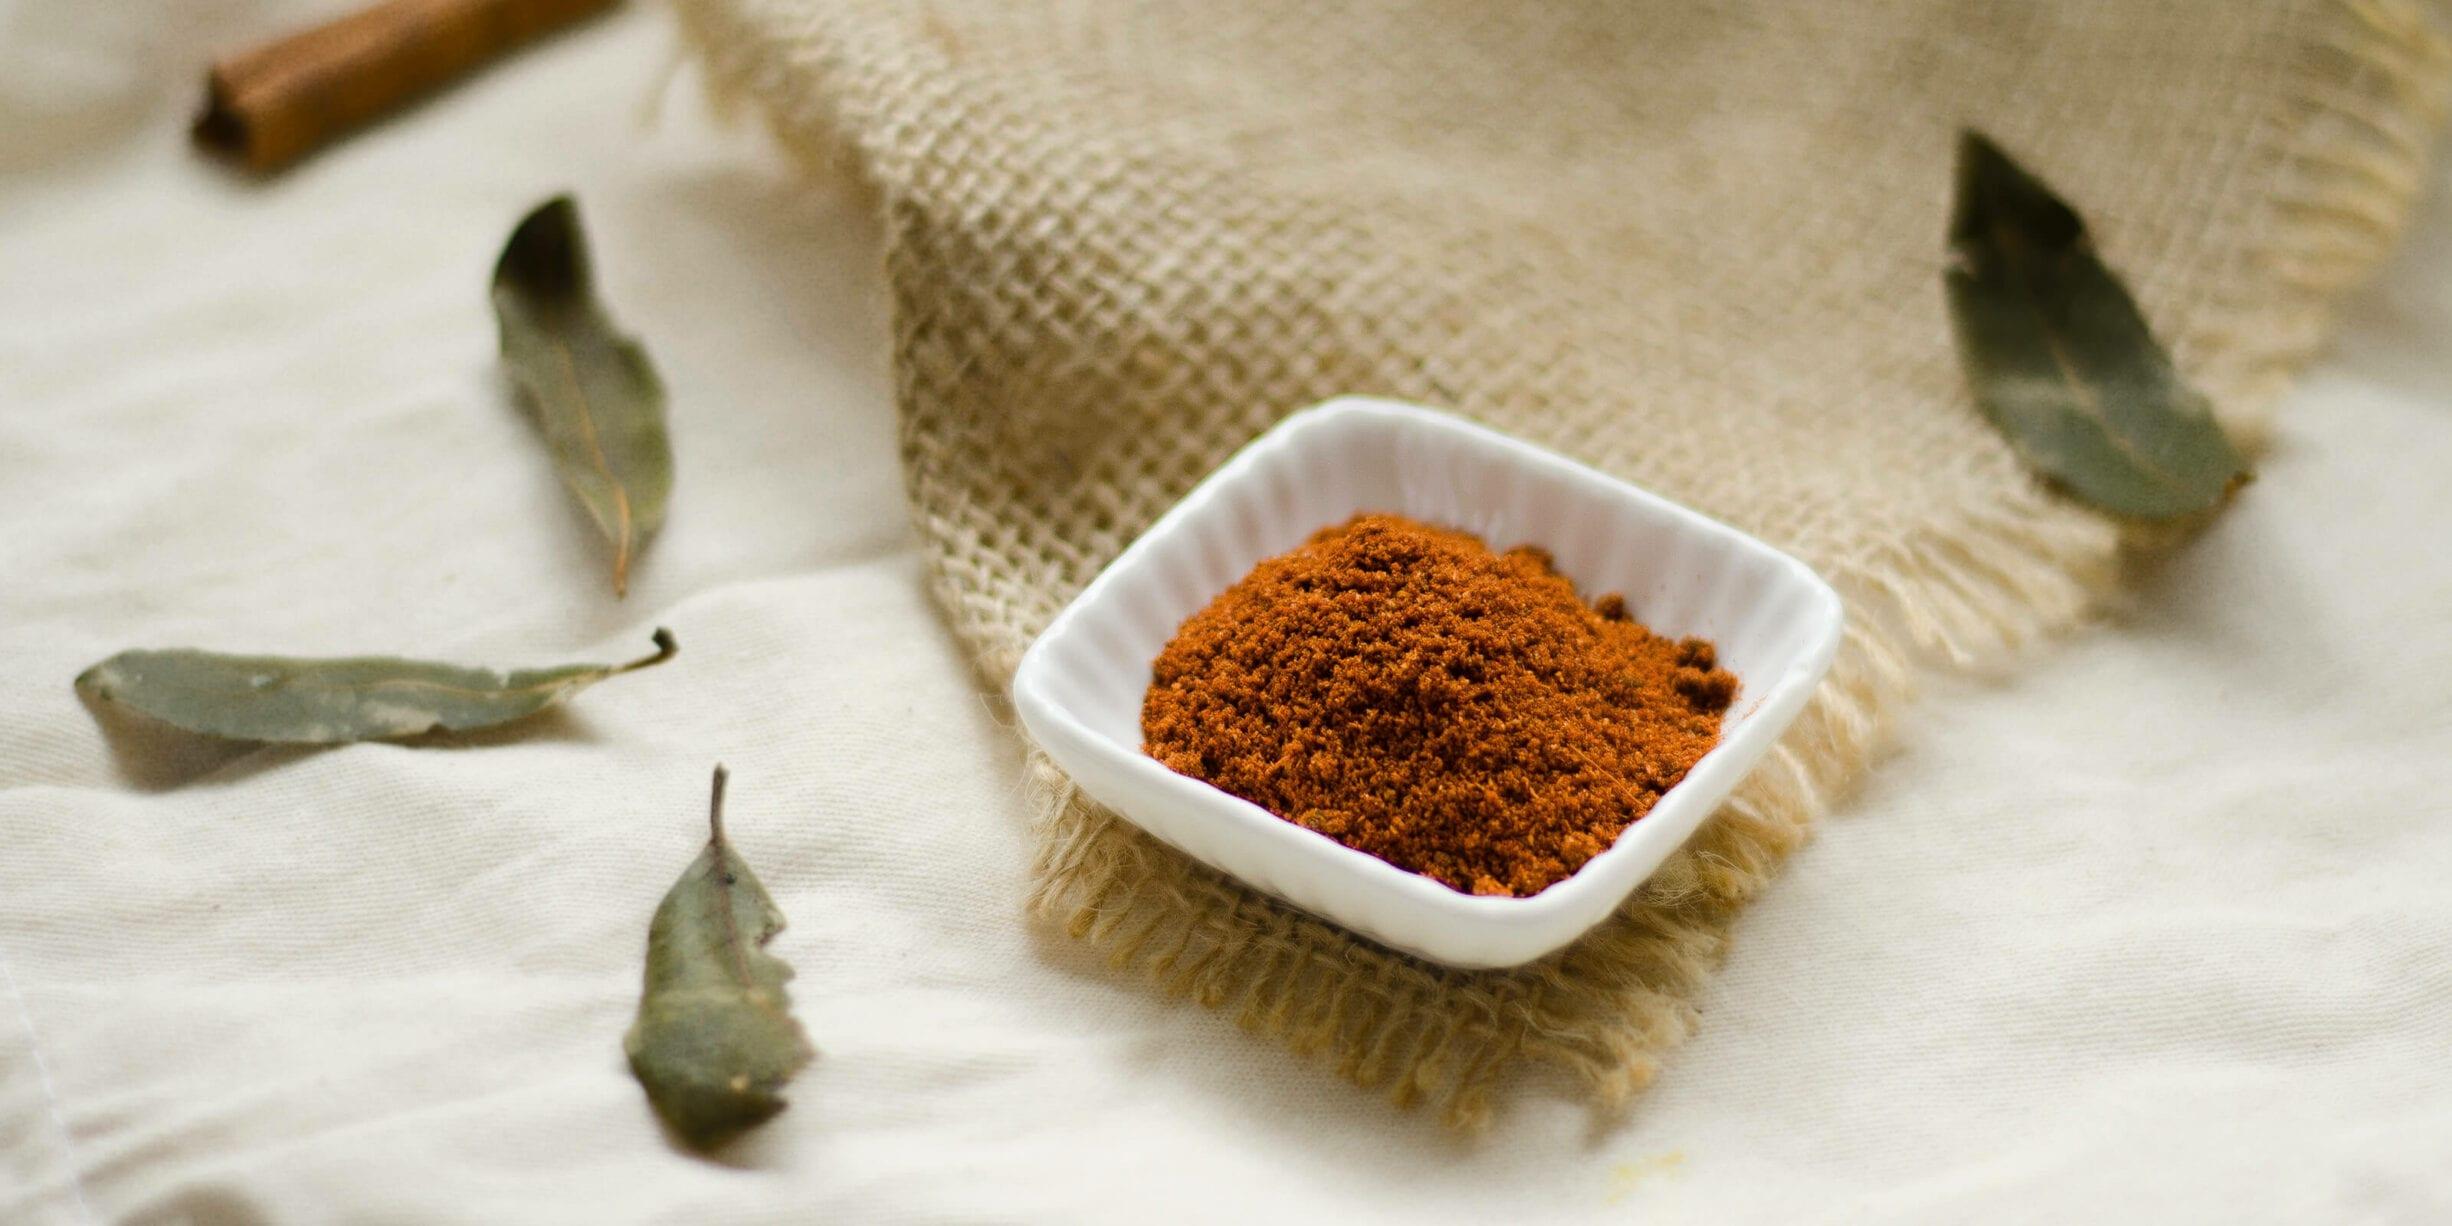 cinnamon powder in bowl, leaves, cloth